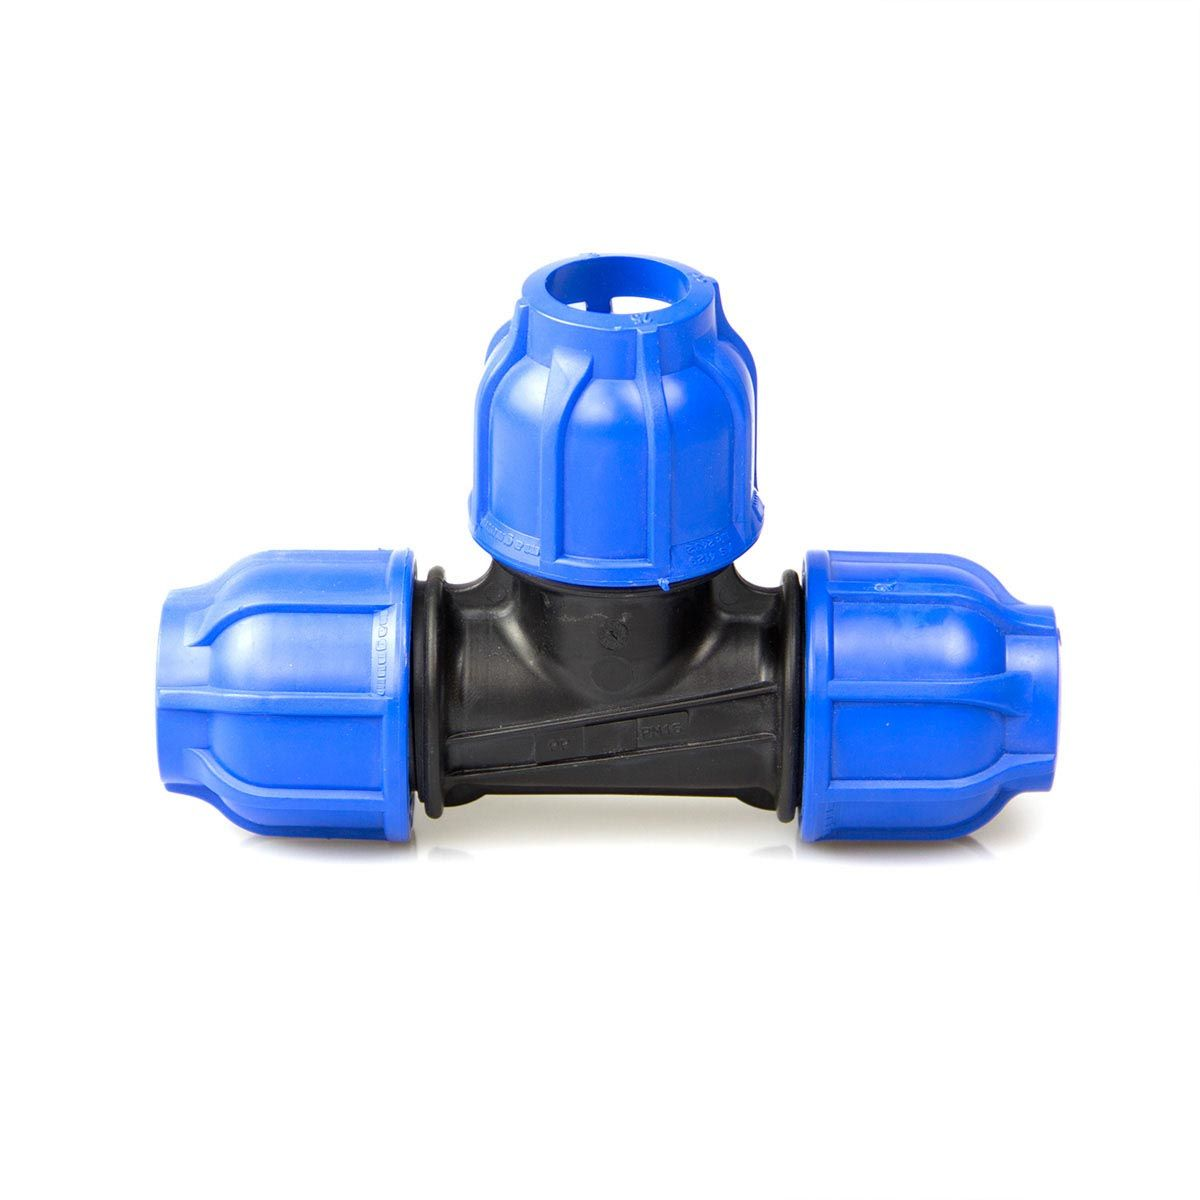 T-Stück, aus PP, blau-schwarz, d 20 mm, PN 16